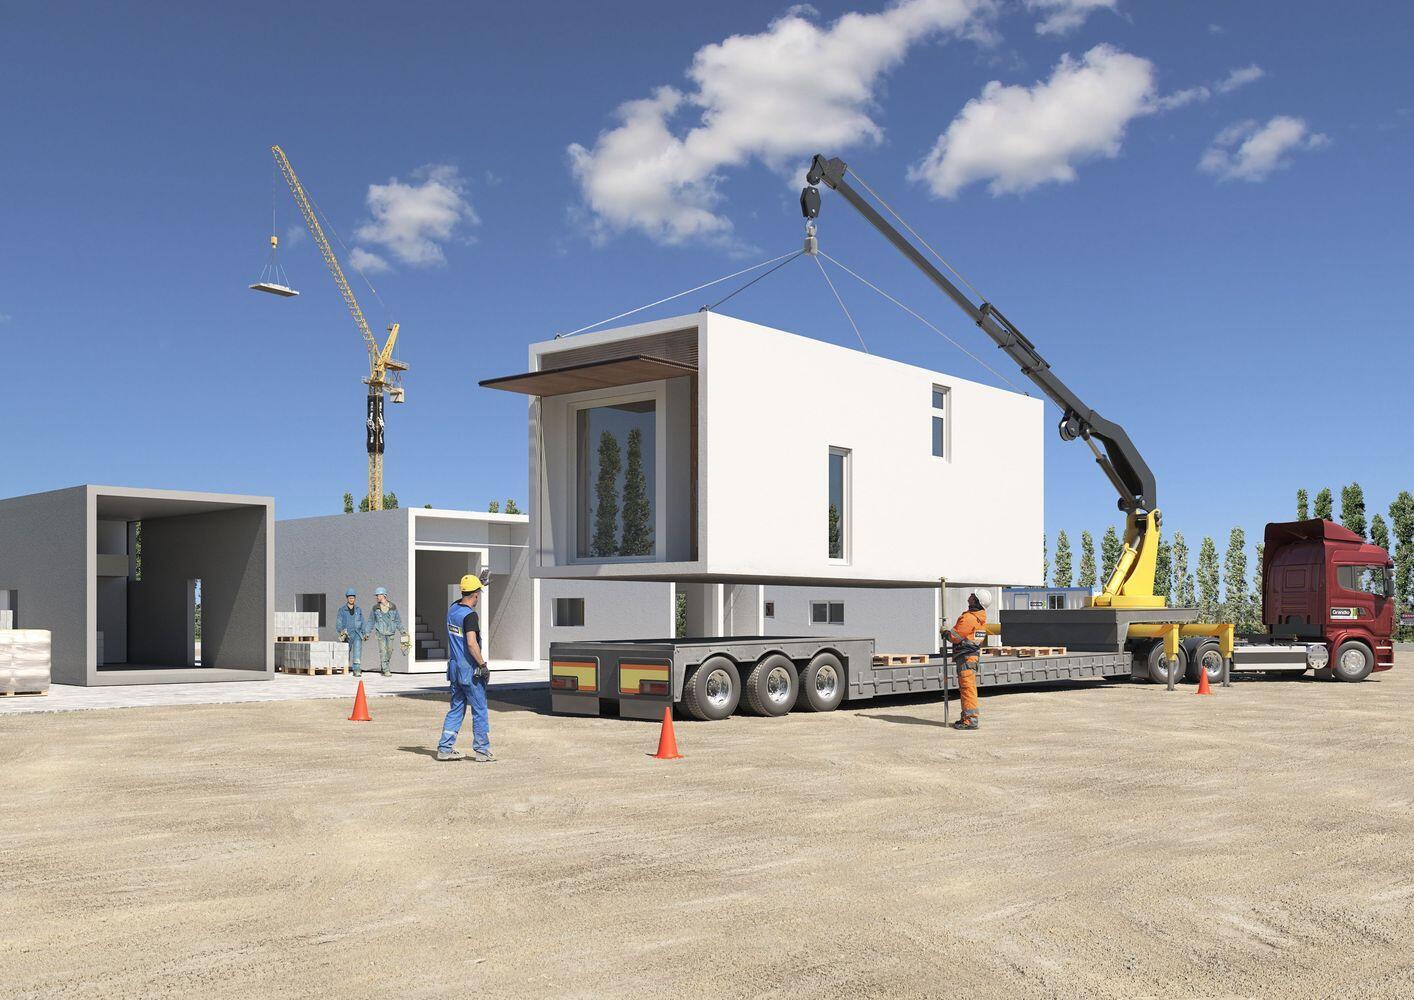 hüga-casas-prefabricadas-desde-10-mil-euros-1-alt